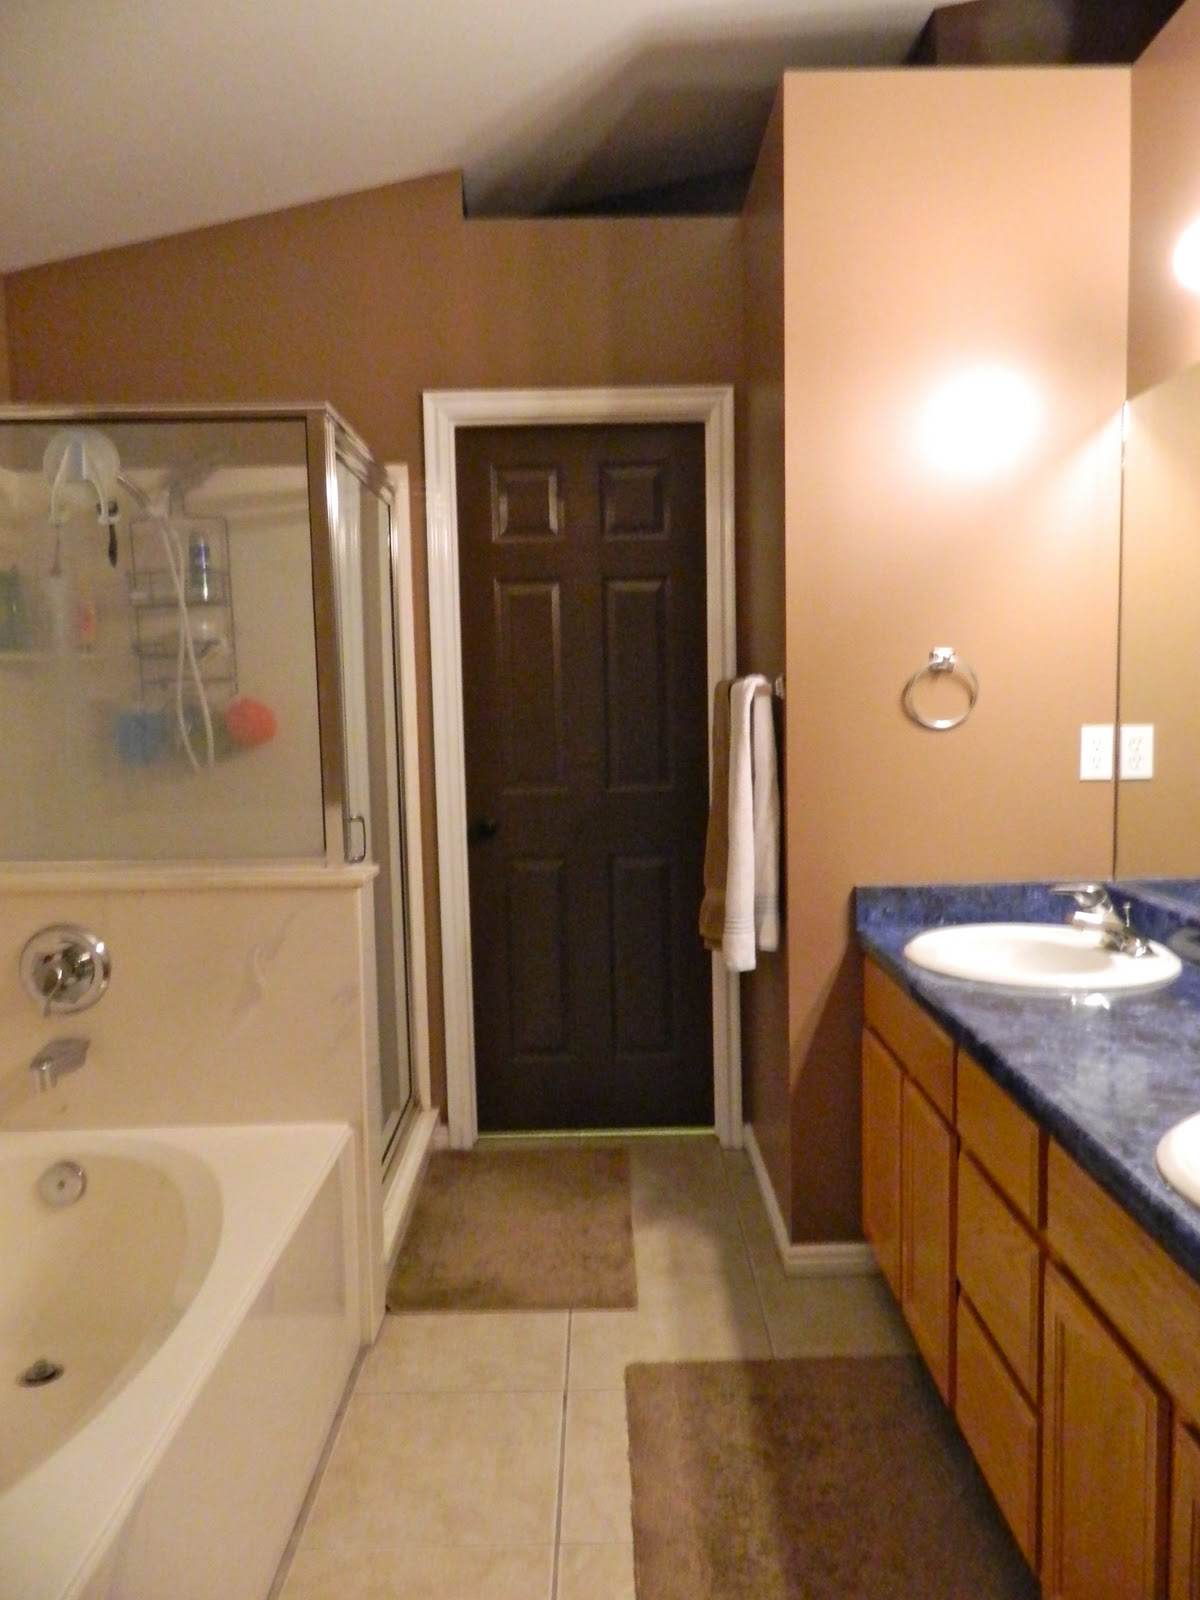 Bathroom With Blue Countertop